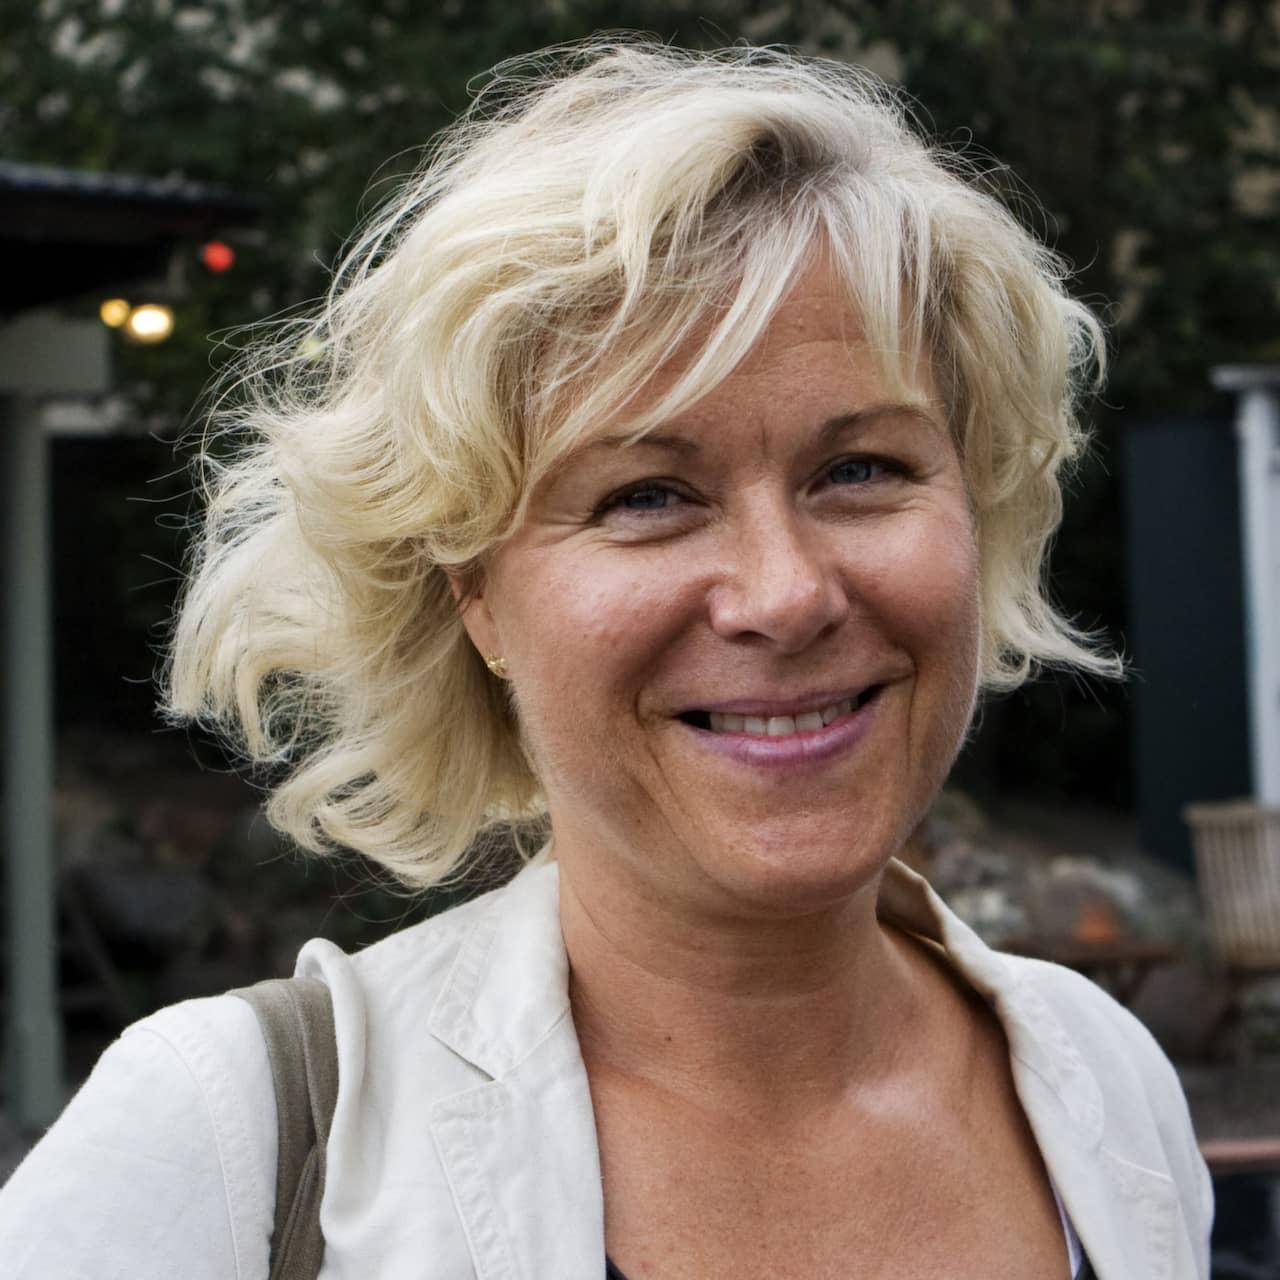 63. Kristina Kappelin